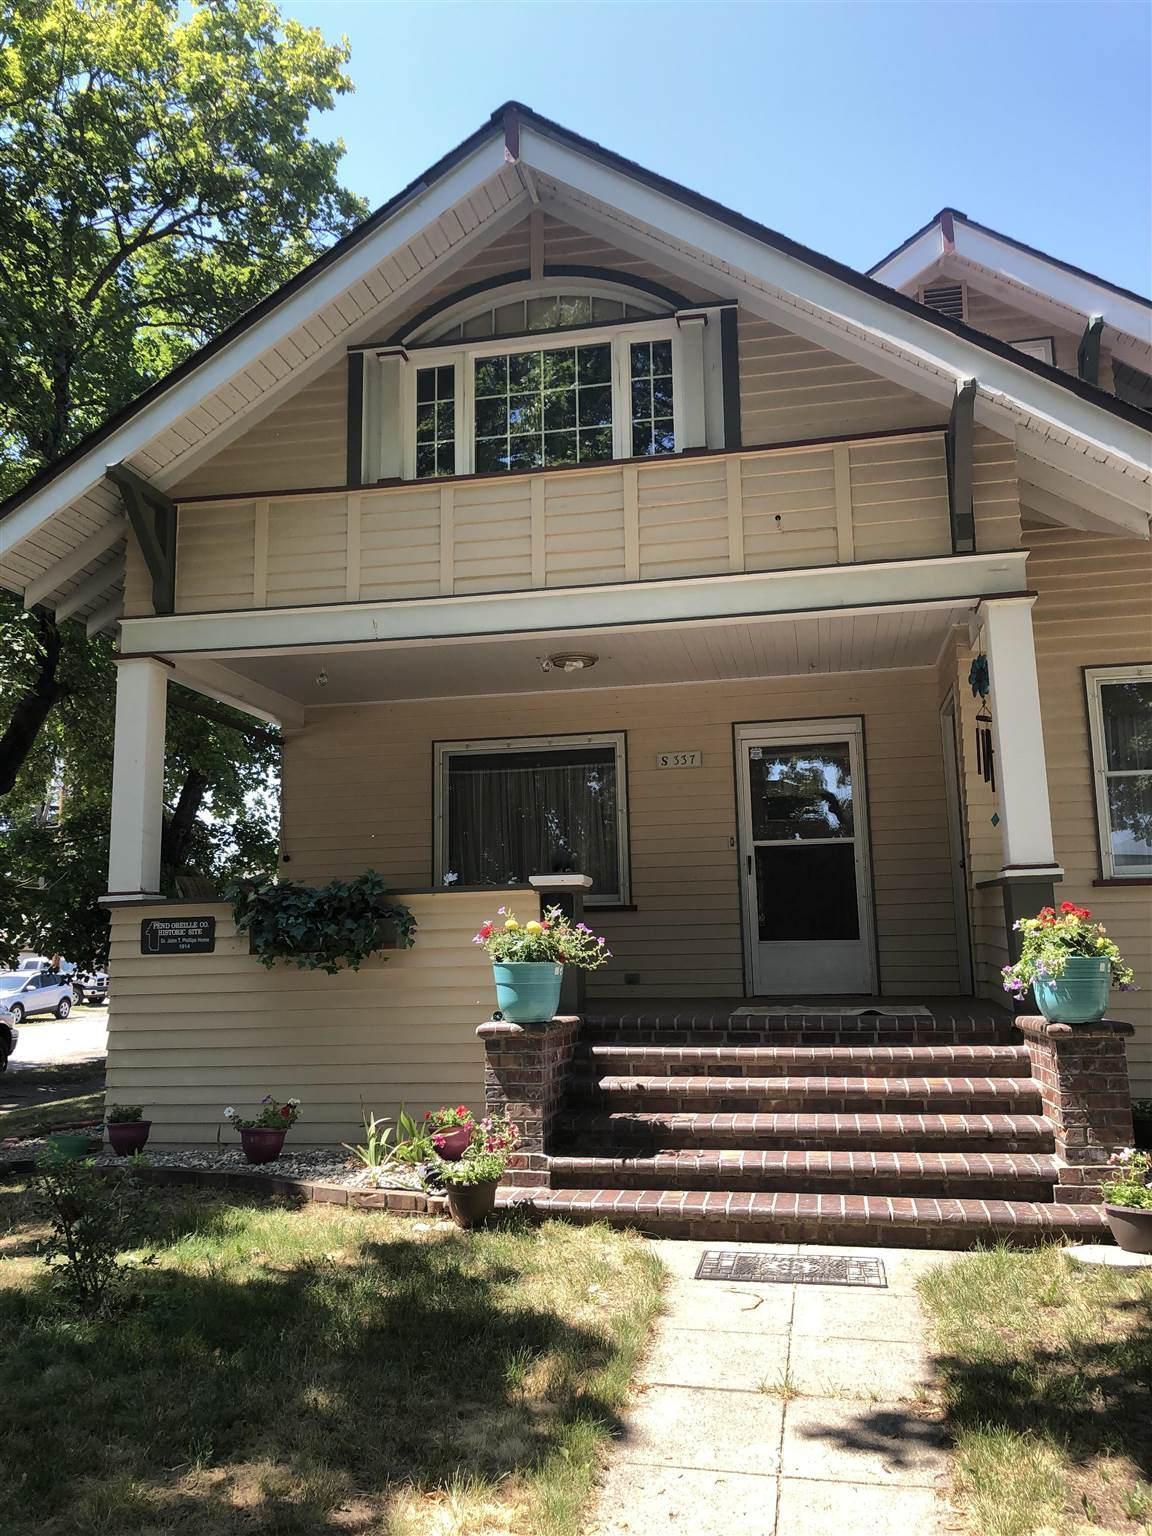 337 S Spokane Ave - Photo 1